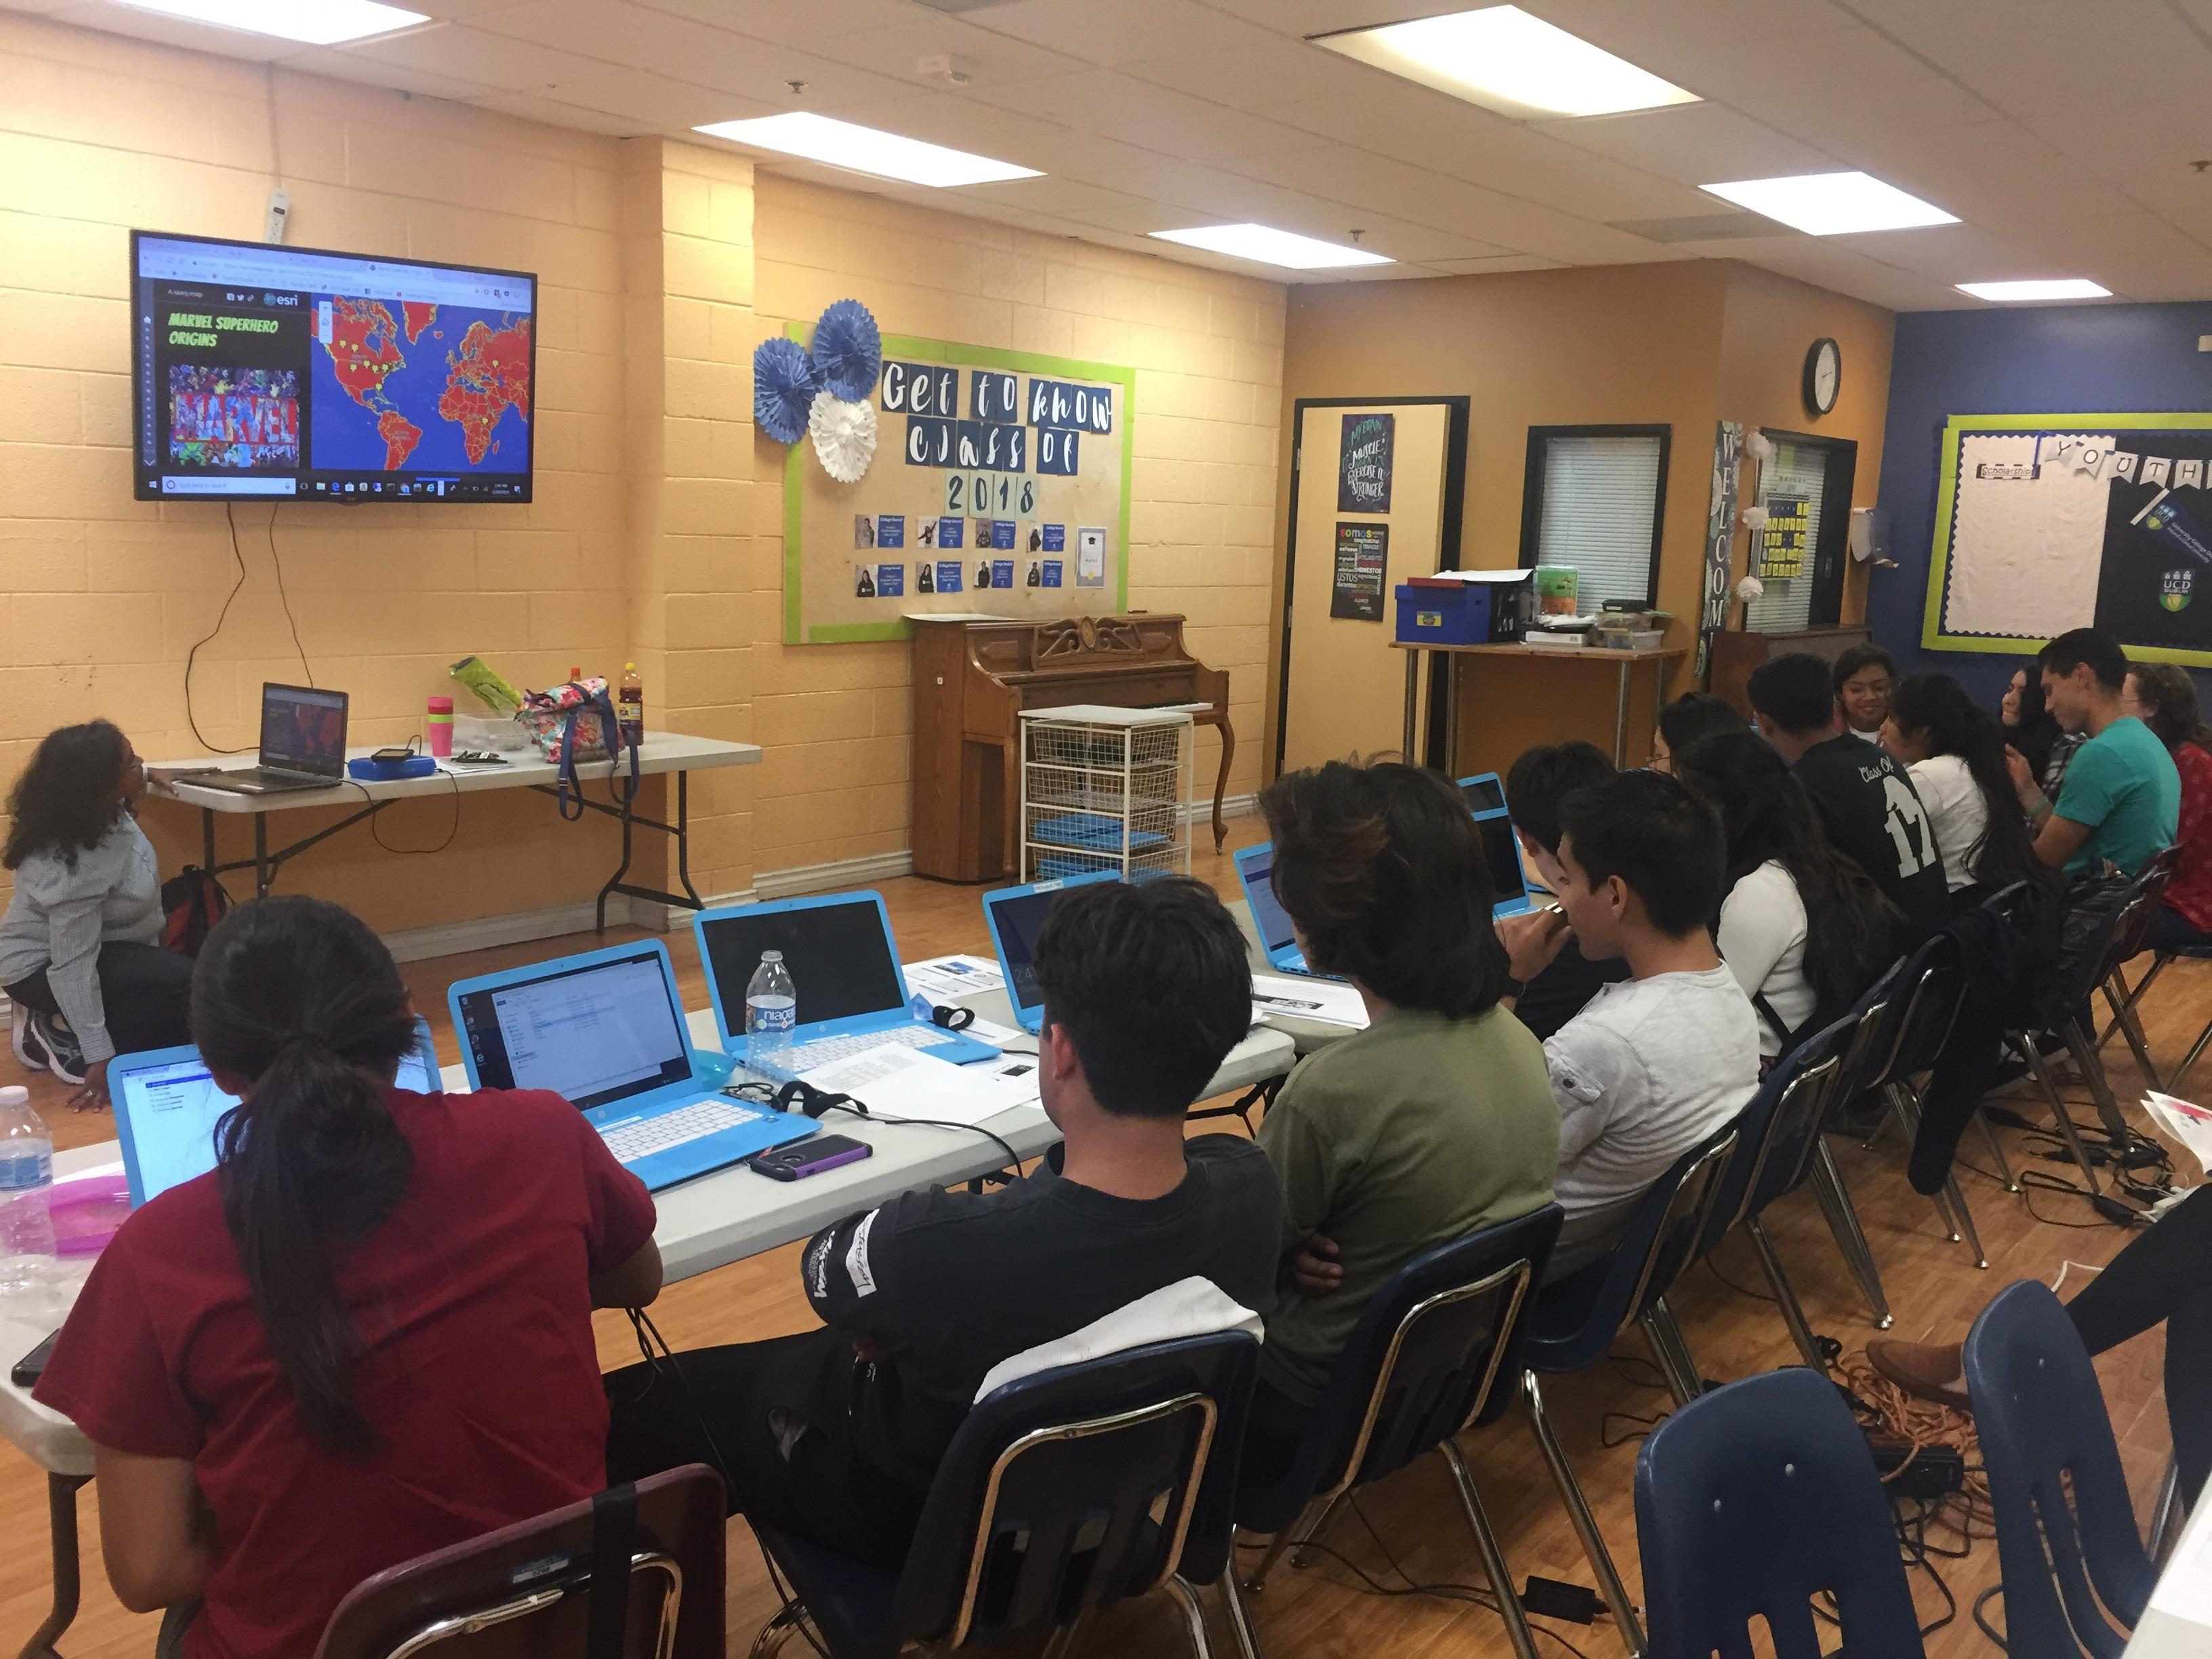 Giscorps Educators Selected Project In Santa Ana